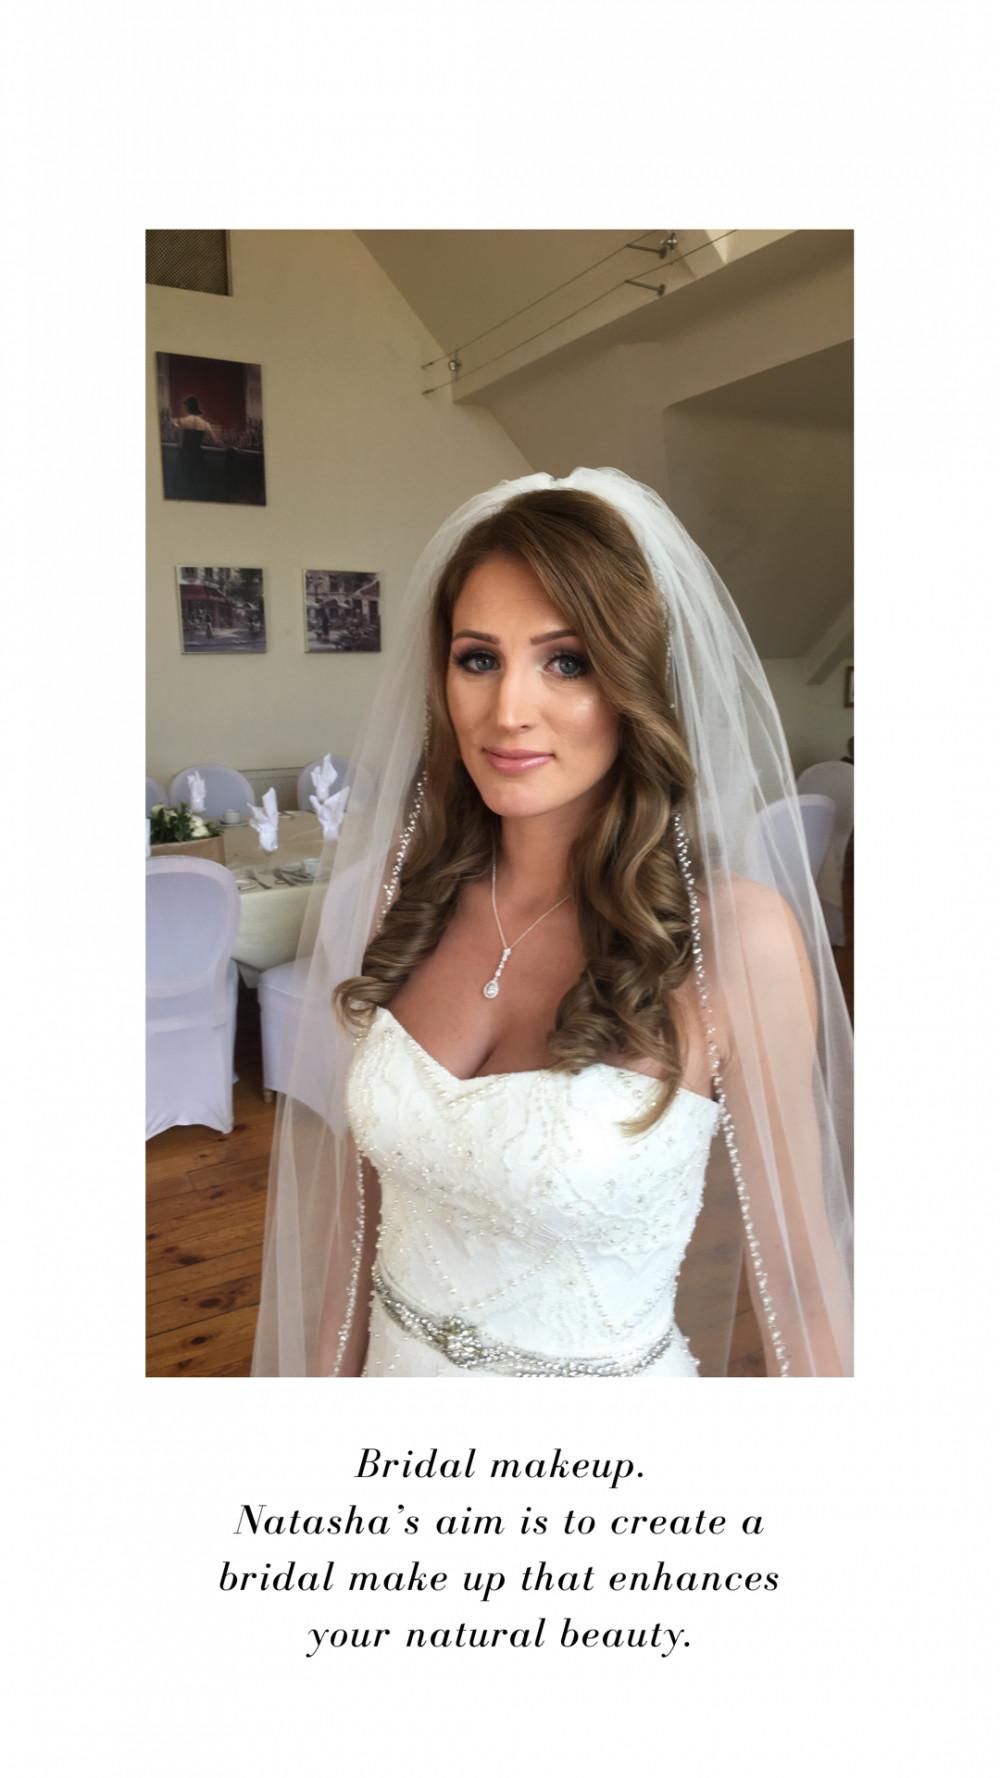 This beautiful bride is giving me Cheryl Cole vibes. Photograph taken by myself with natural daylight only. - Make Me Bridal Artist: Natasha Jane makeup . Photography by: Natasha Shildrick. #bridalmakeup #weddinghairandmakeup #bride #weddingmakupartist #mua #weddingmua